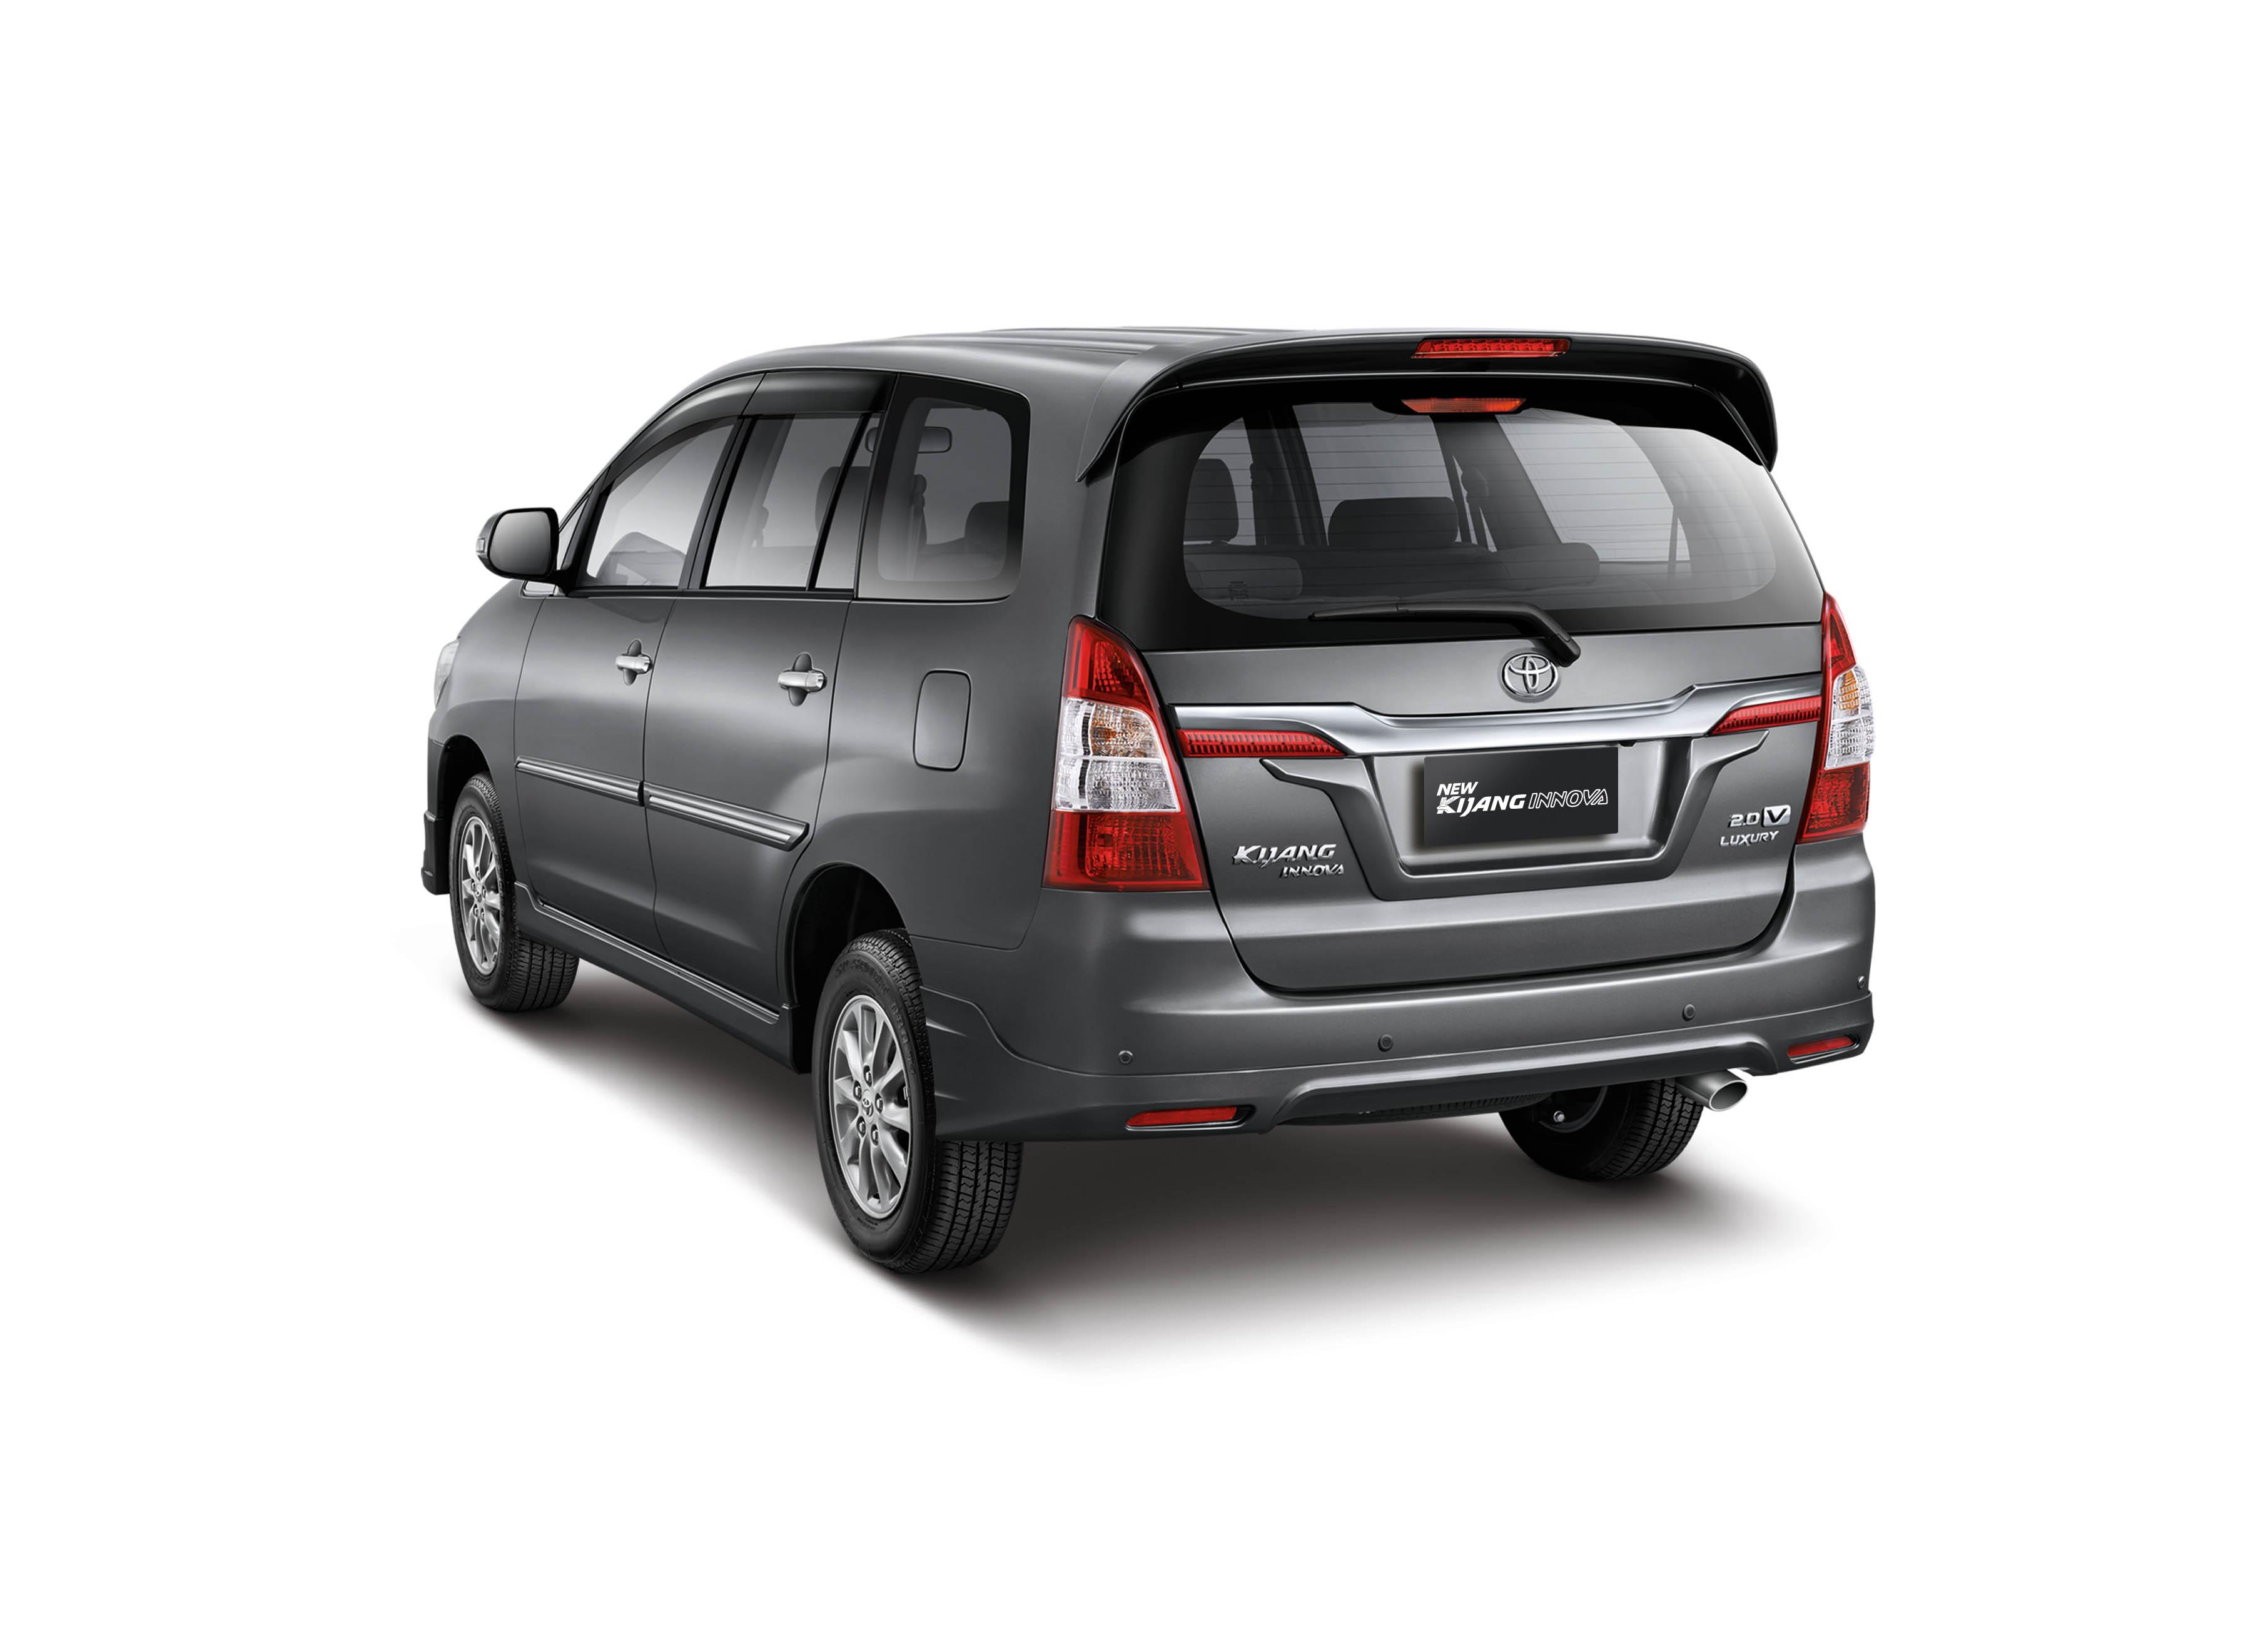 Mobil Baru, Toyota Kijang Innova 2013 belakang: Nih Gambar High Resolution Foto Kijang Innova Facelift 2013